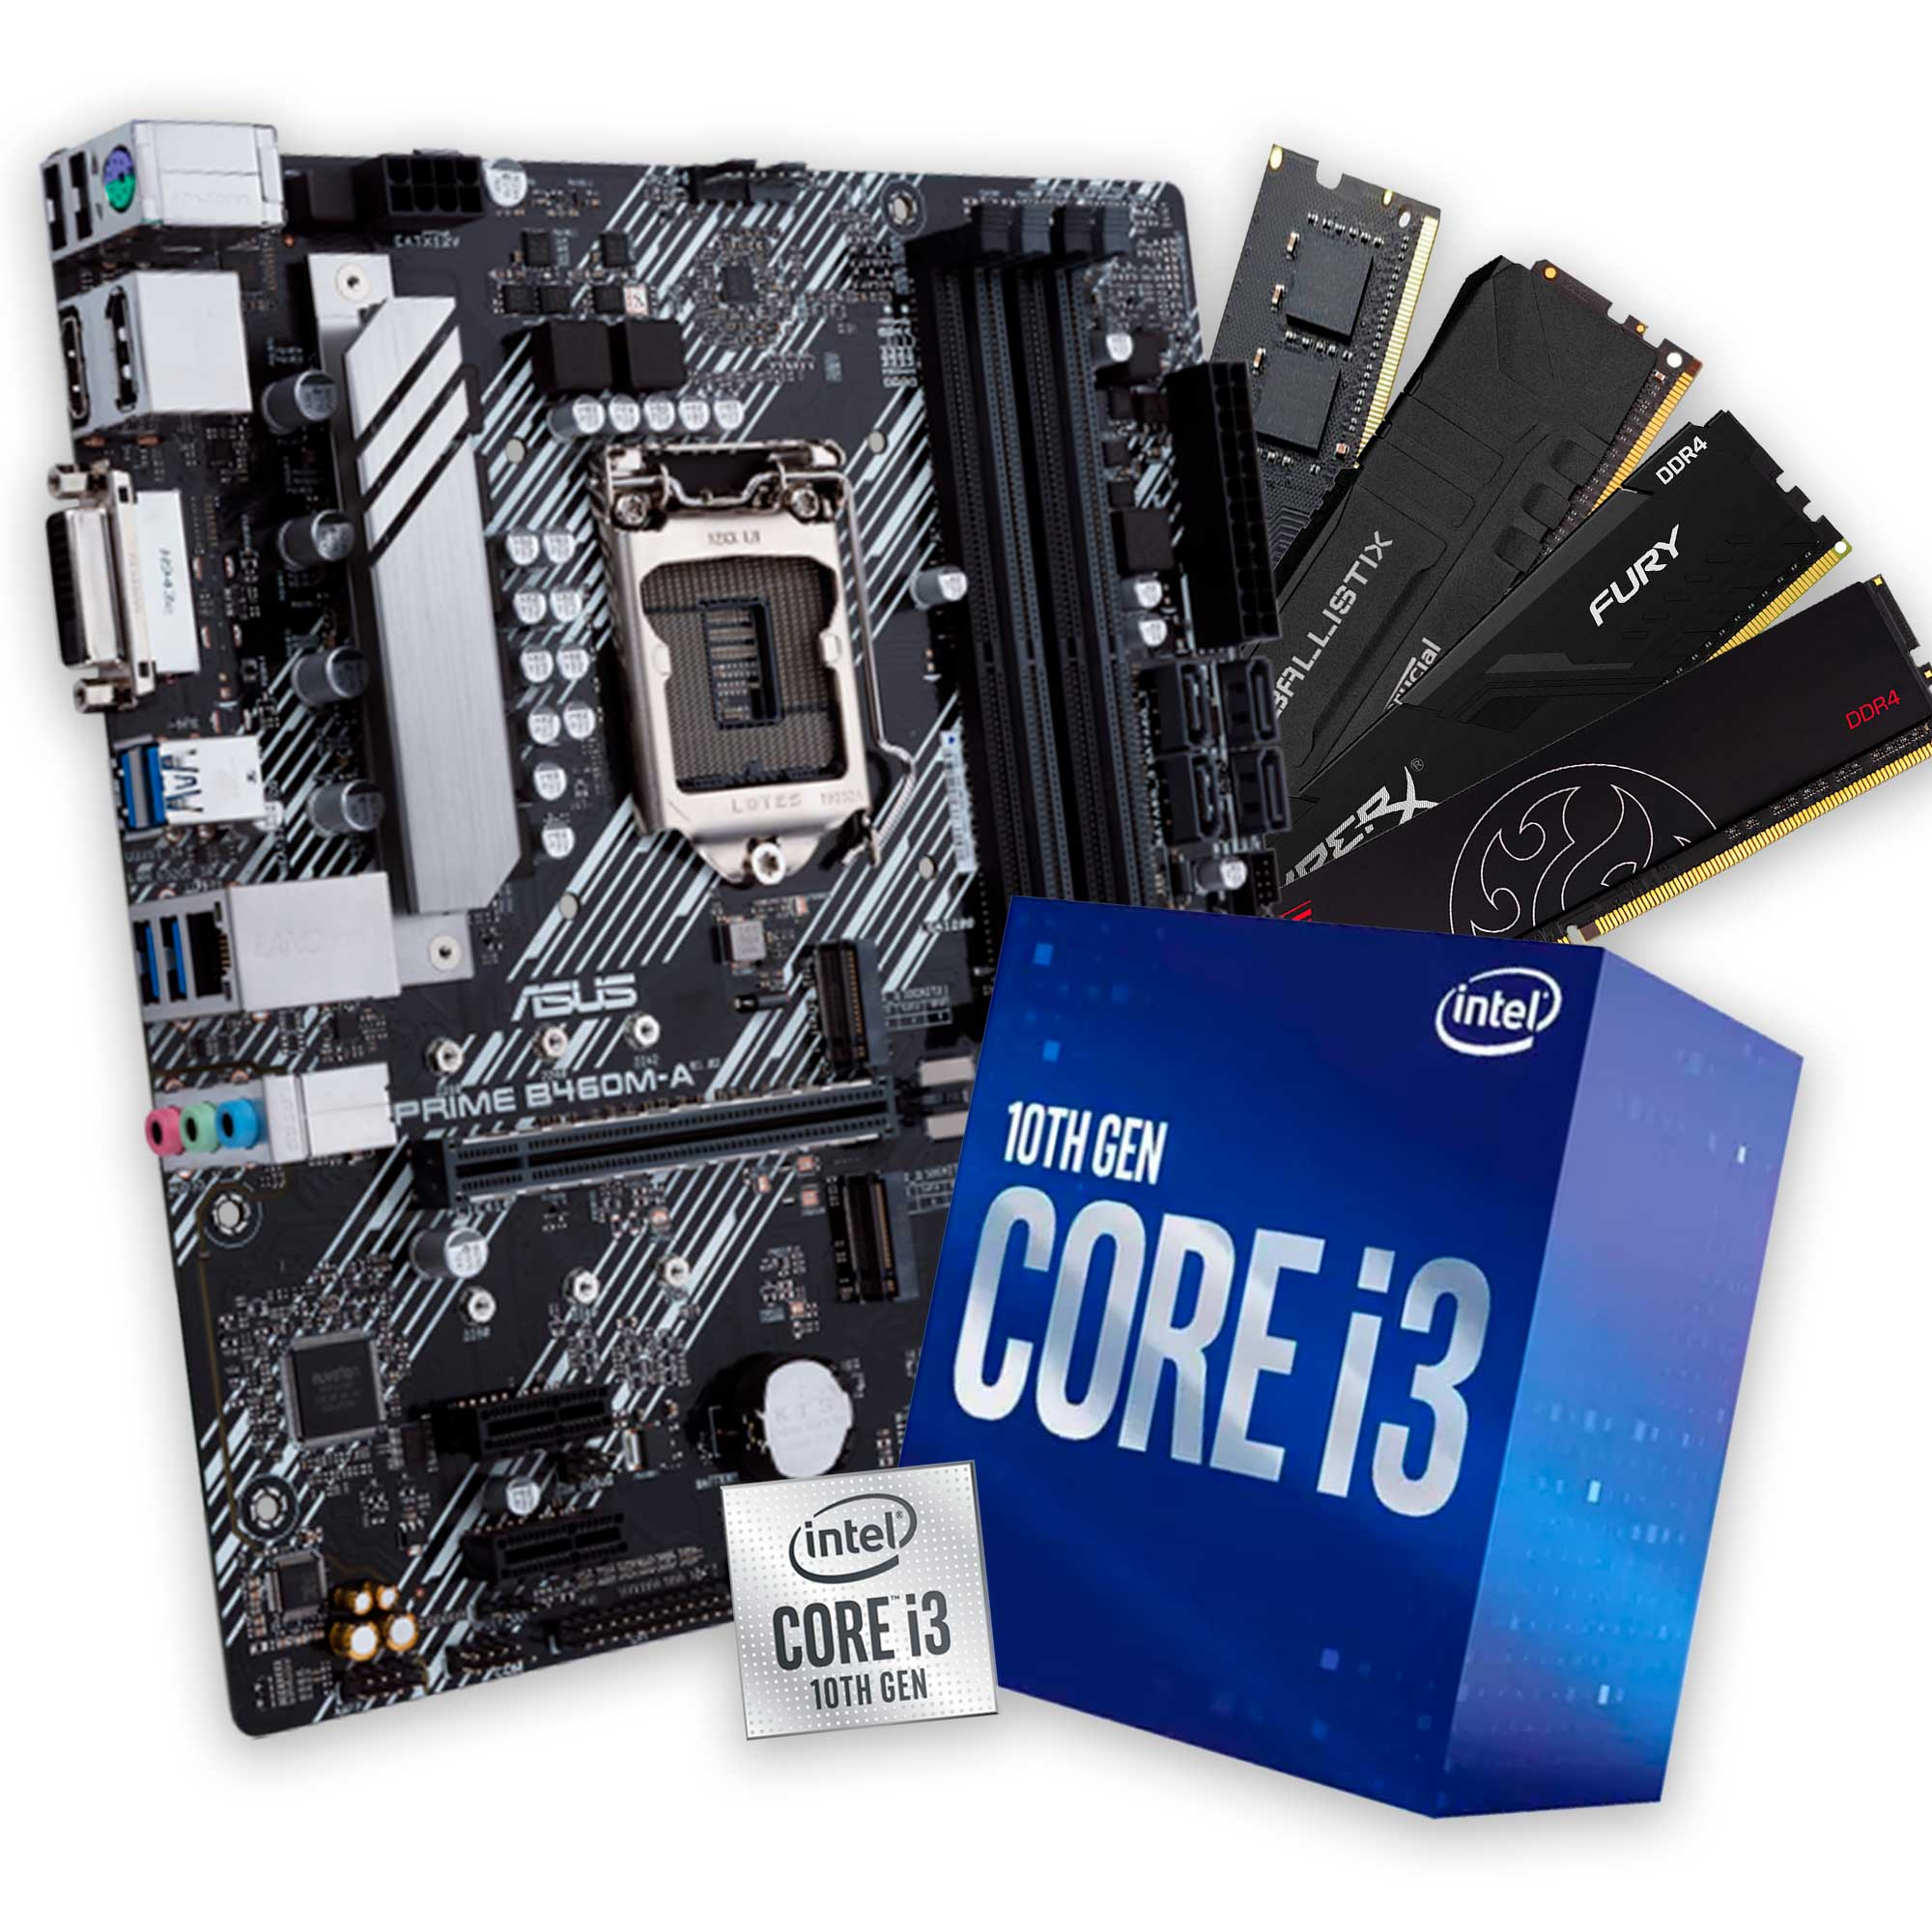 Kit Upgrade, Intel Core i3 10100F, Placa mãe Asus H410M-E, Memória DDR4 8GB 2666MHz